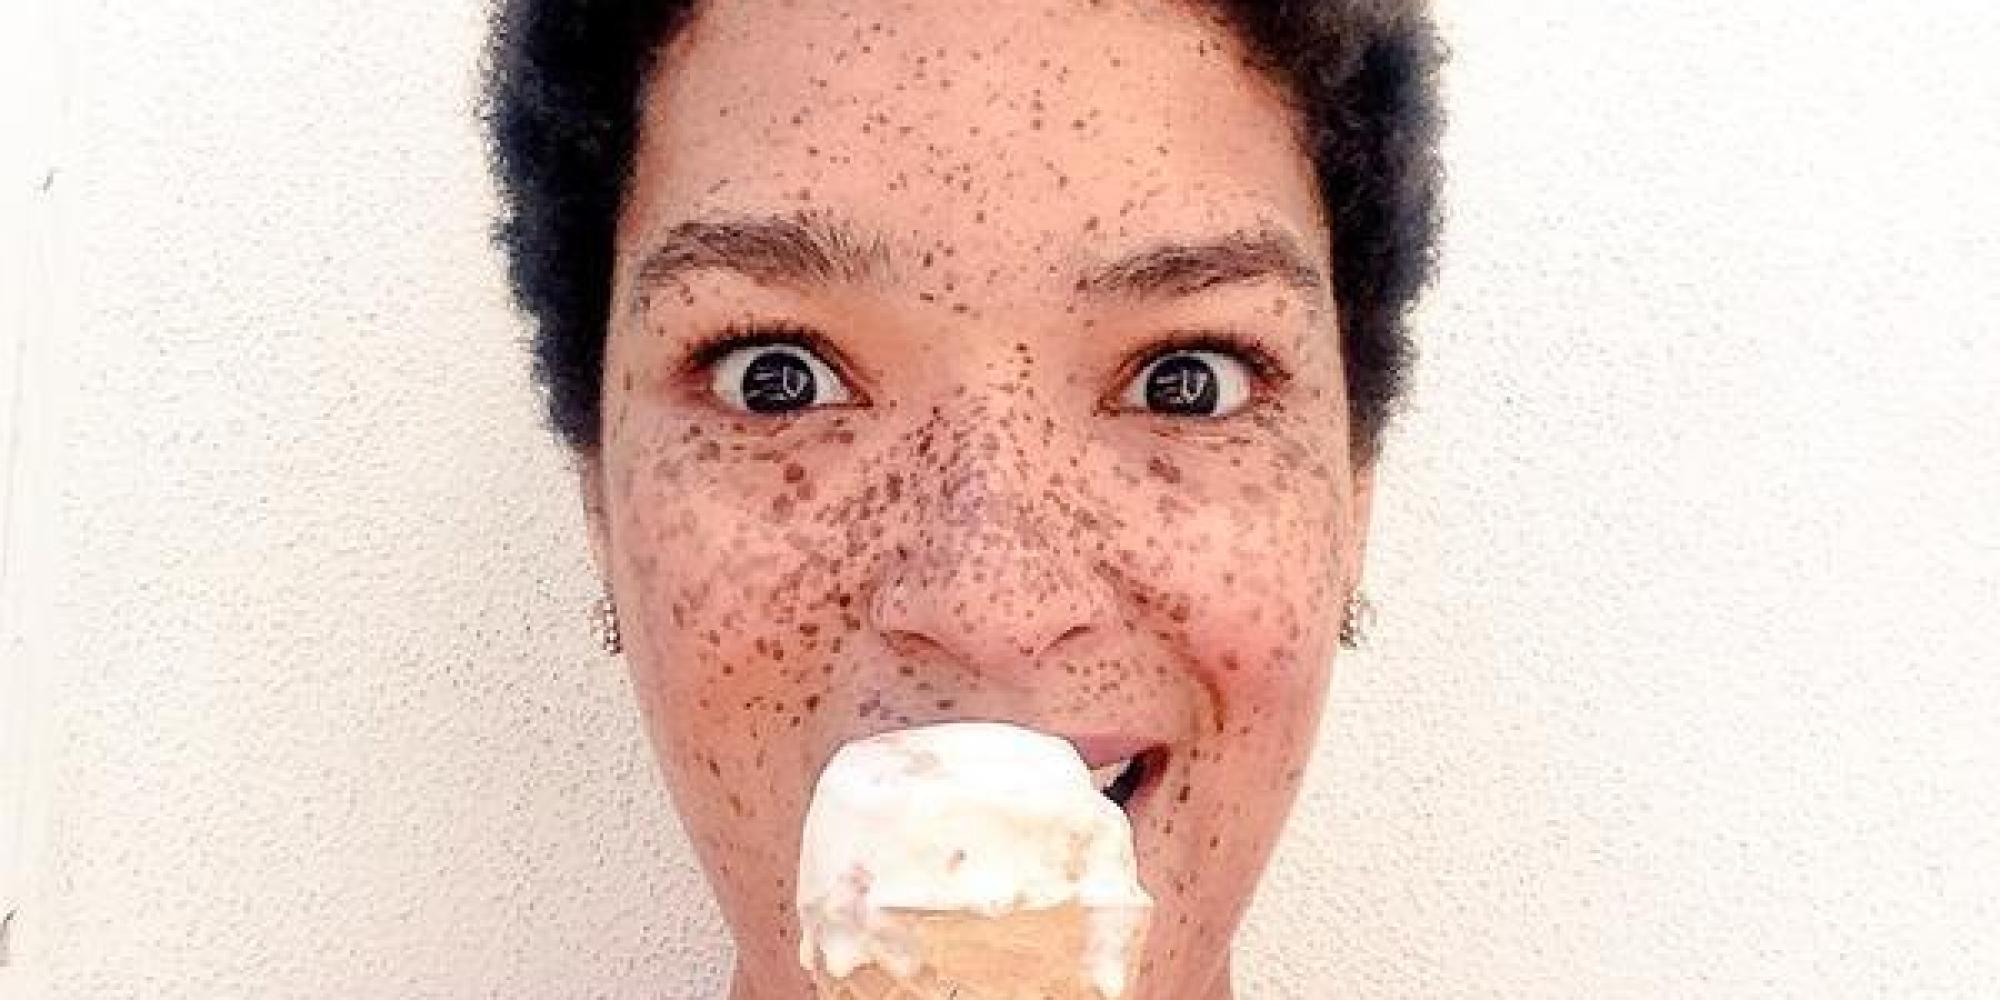 Freckles Net Worth